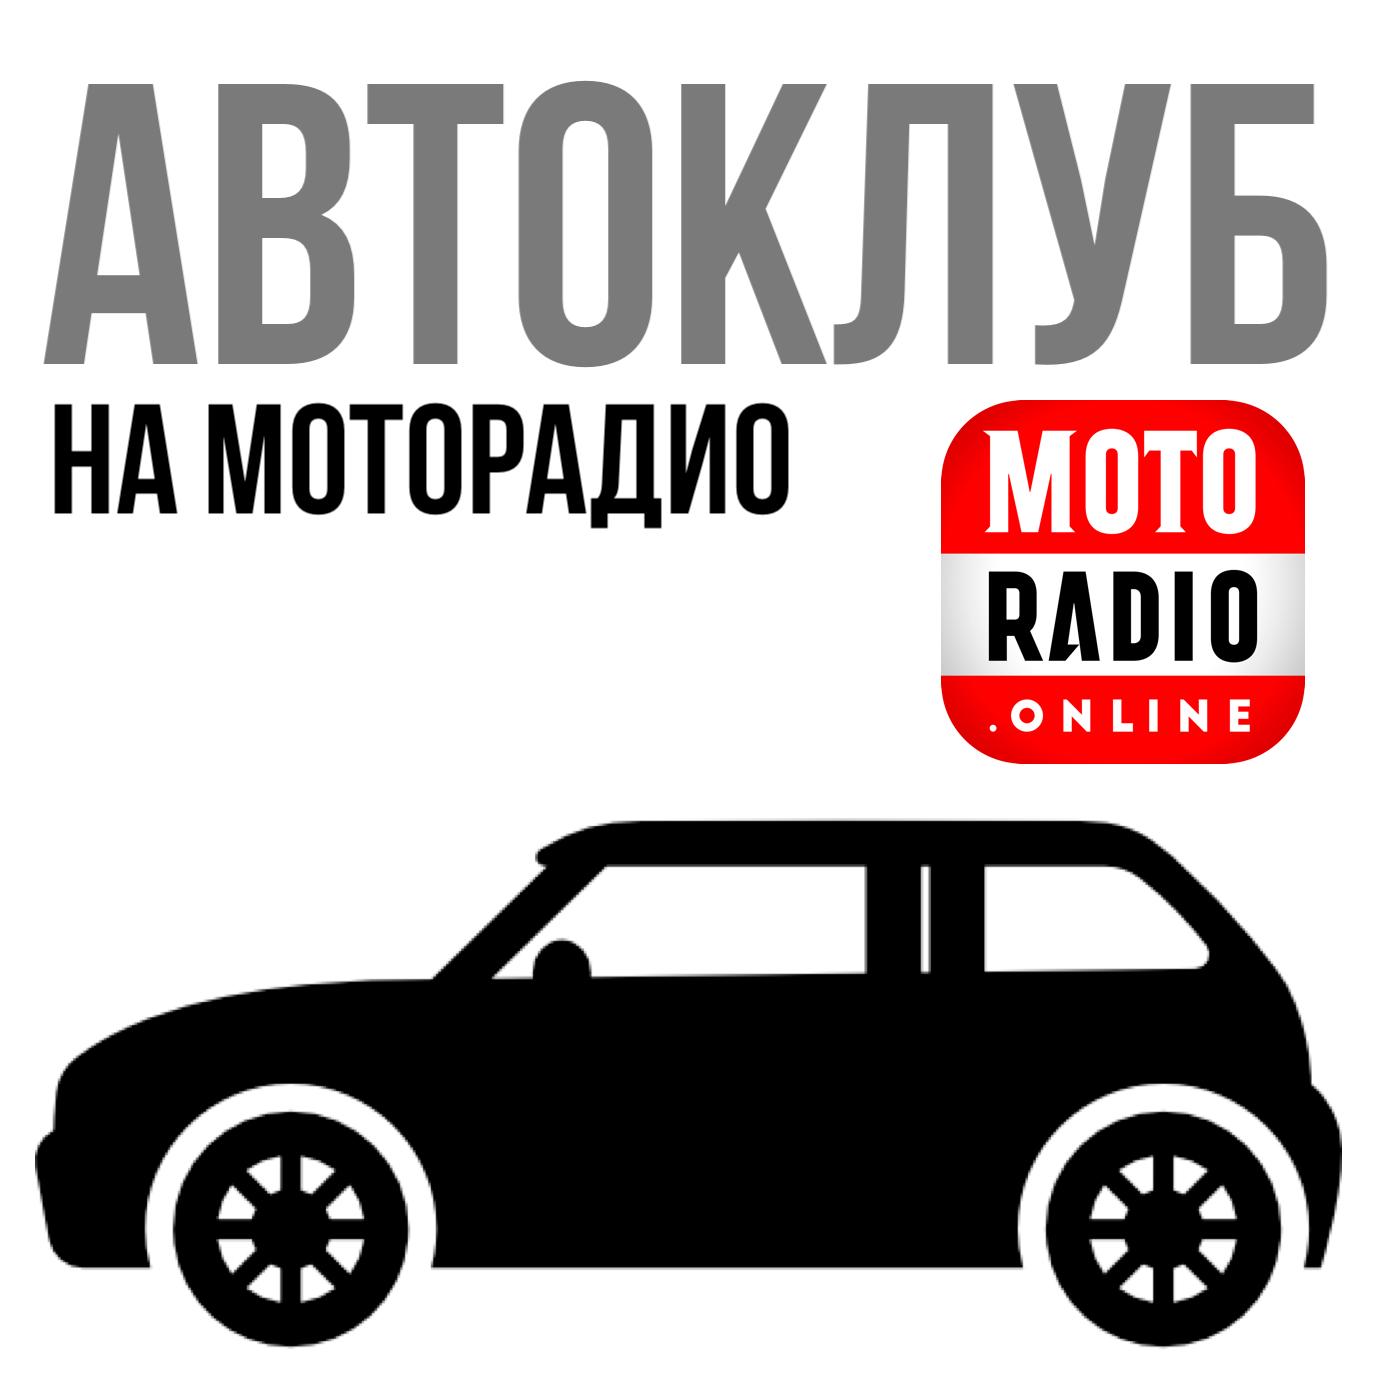 цена на Александр Цыпин Может ли муж научить жену водить автомобиль? Программа